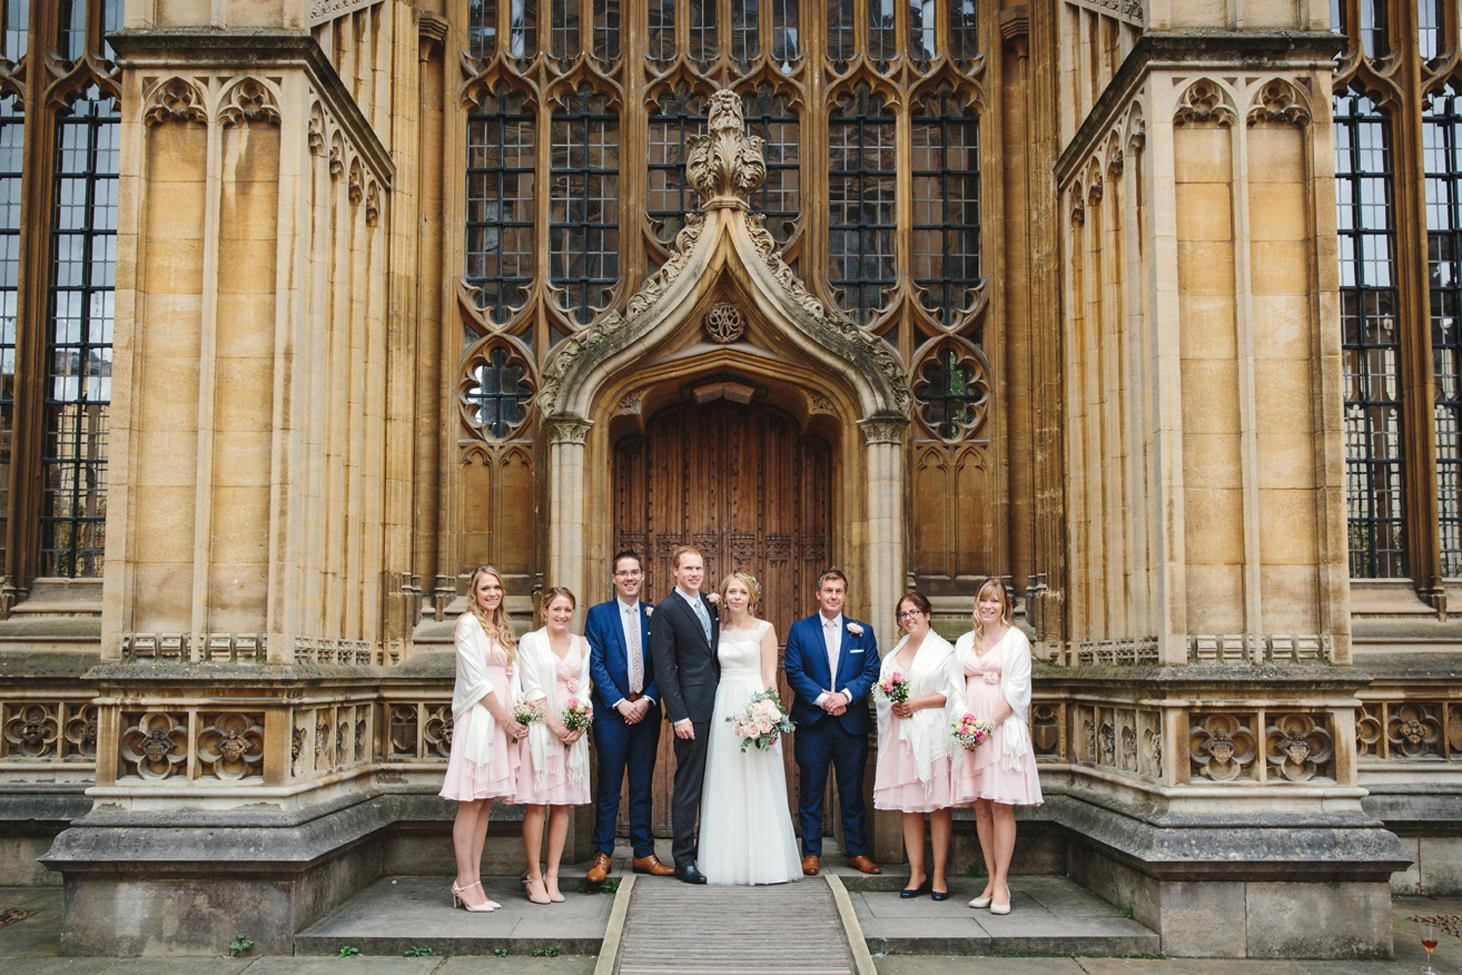 Bodleian library wedding bridesmaids and groomsmen